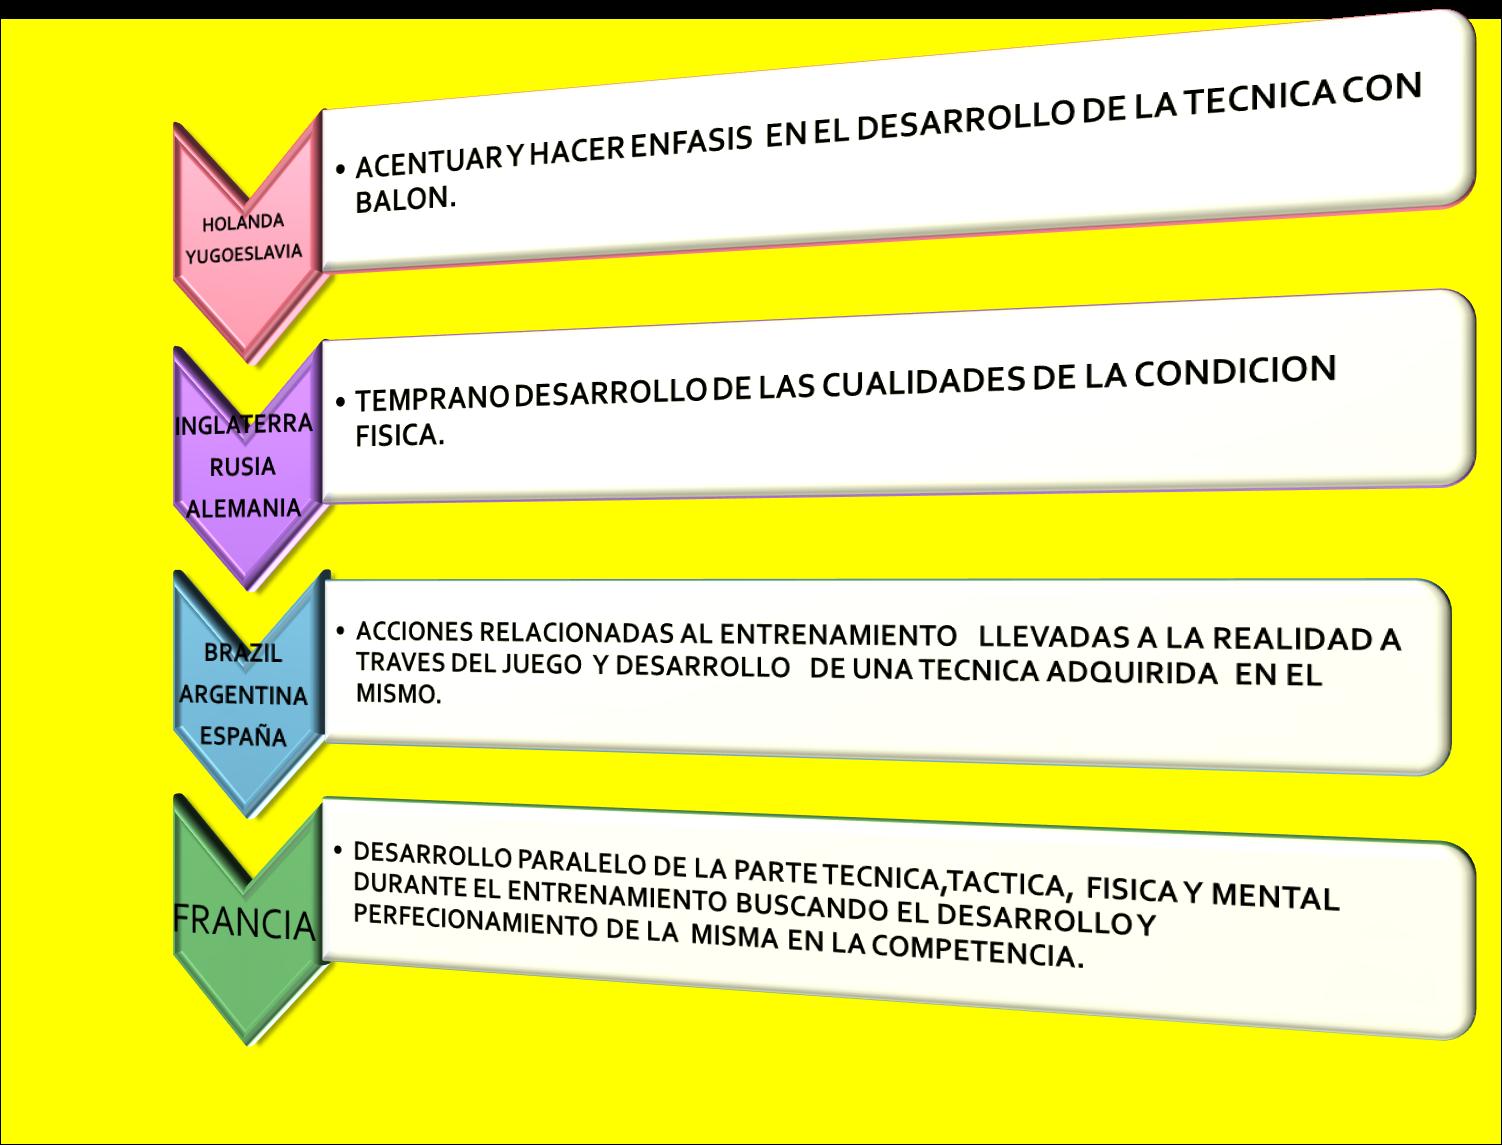 http://3.bp.blogspot.com/_UM4DyDeANwE/TMWbNfphAuI/AAAAAAAAAds/zDvVysVlgCw/s1600/MODELOS+EN+EL+MUNDO+FUTBOL.png